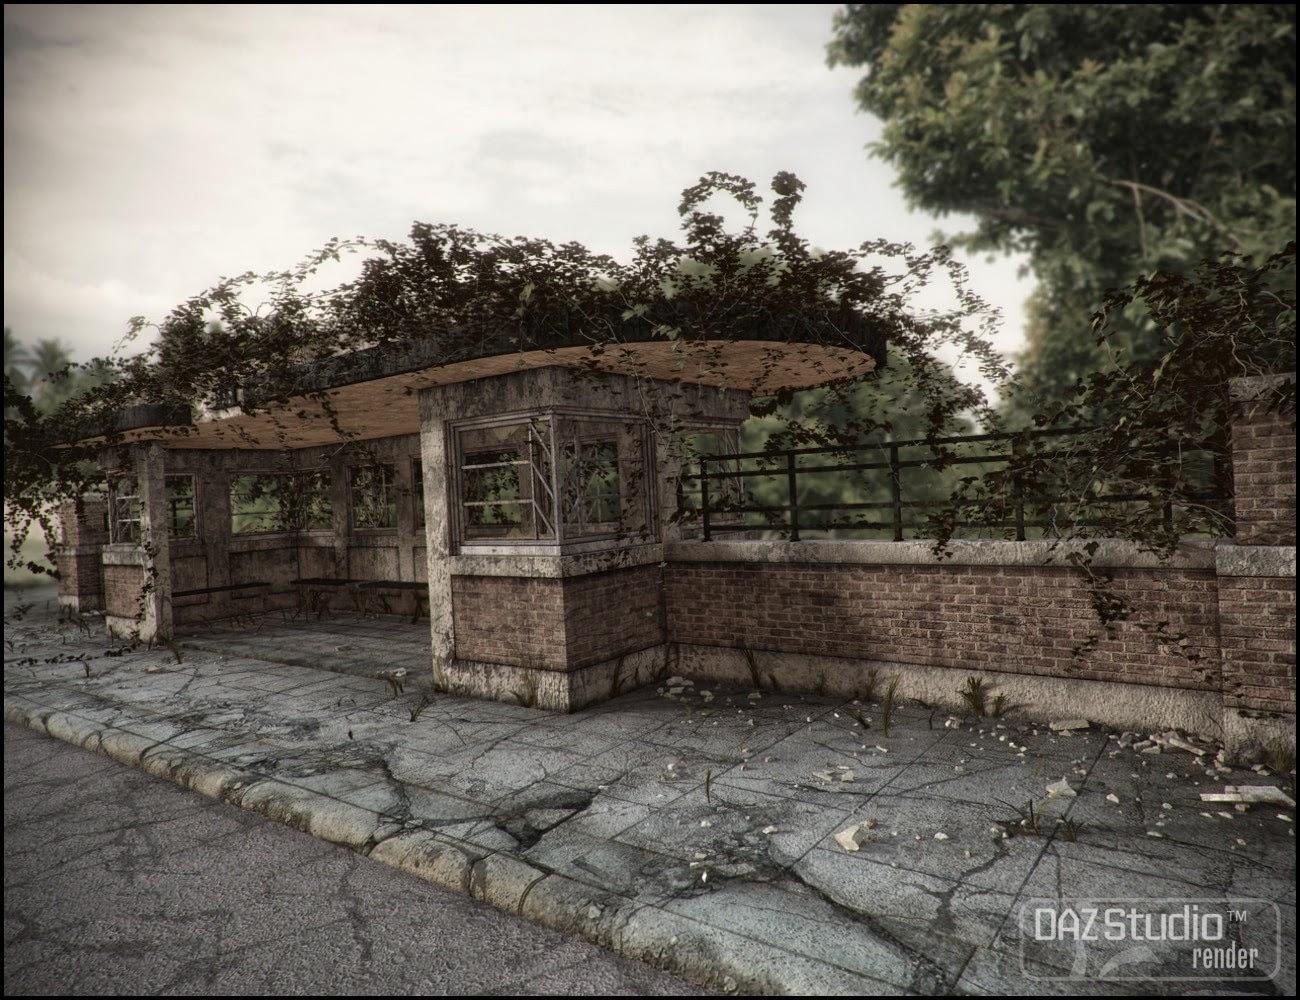 Bus Stop Deco - Last Stop